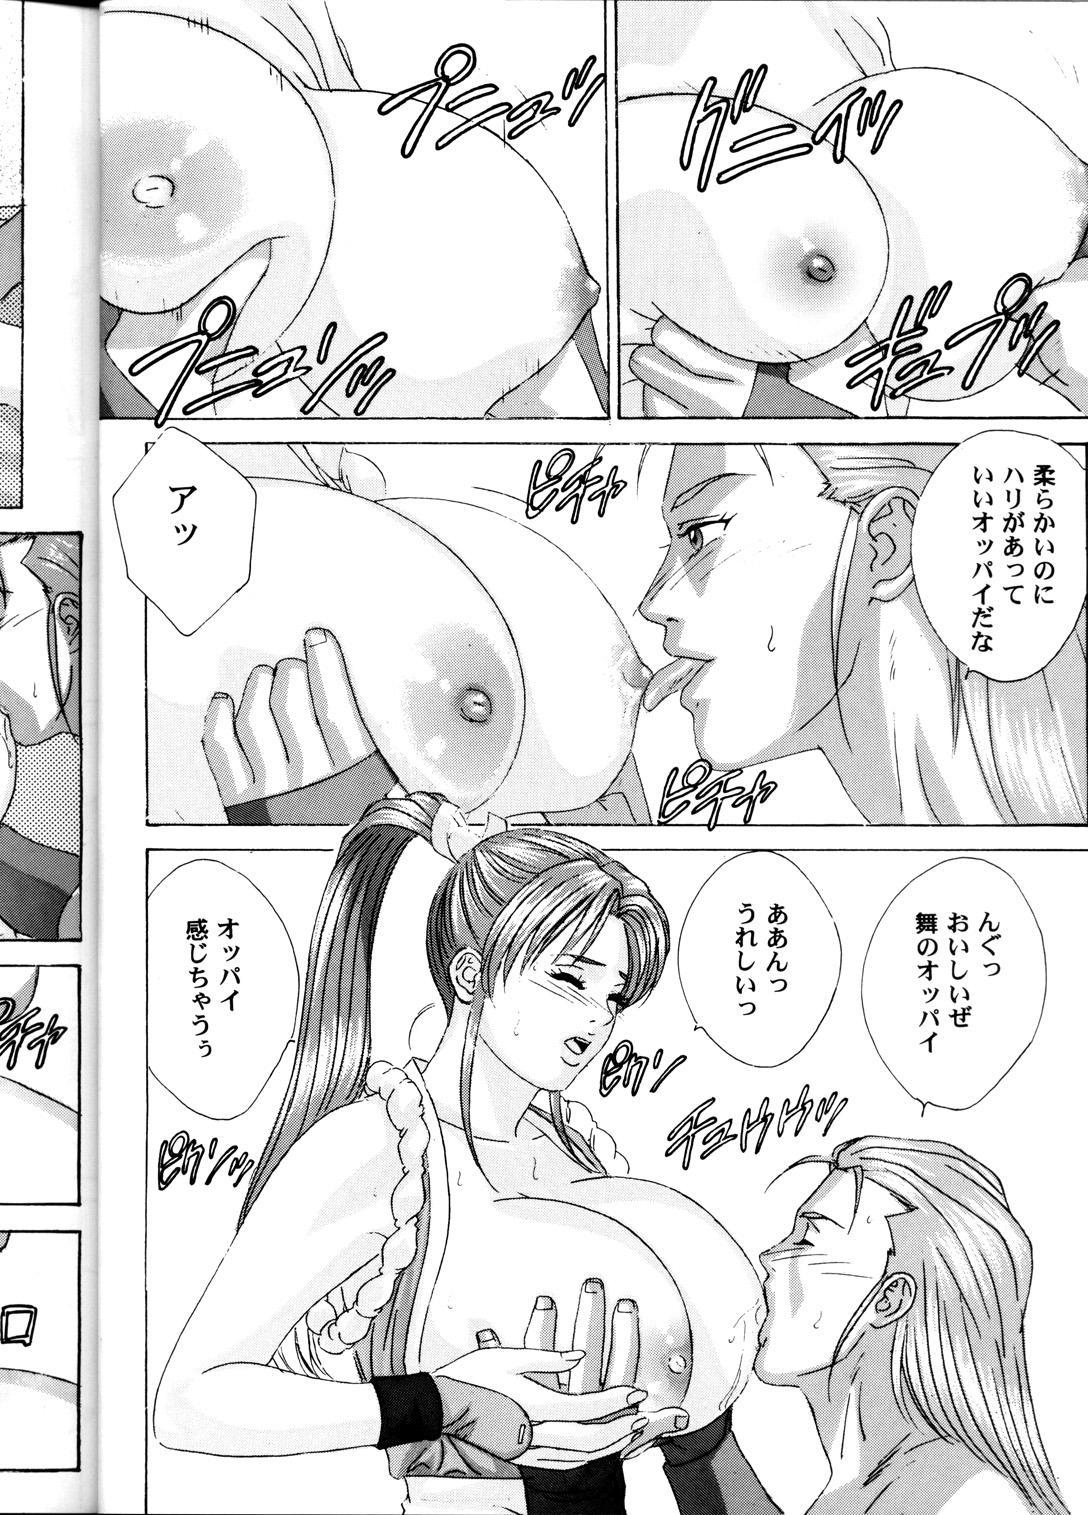 (C60) [D-LOVERS (Nishimaki Tohru)] Mai -Innyuuden- Daiichigou (King of Fighters) 18